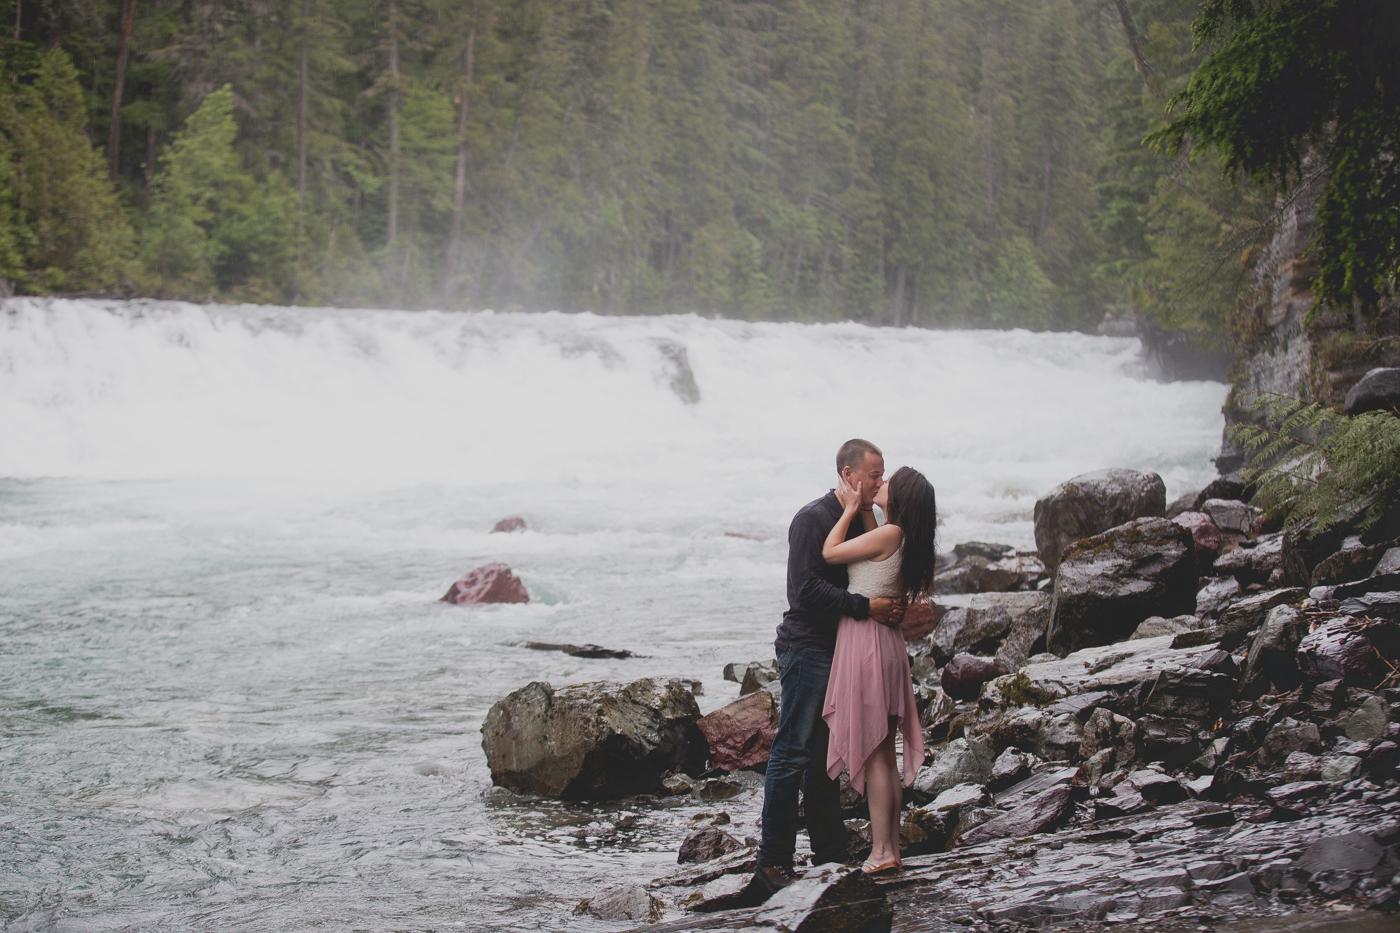 Jennifer_Mooney_Photo_shaw_engagement_session_glacier_national_park_00019.jpg